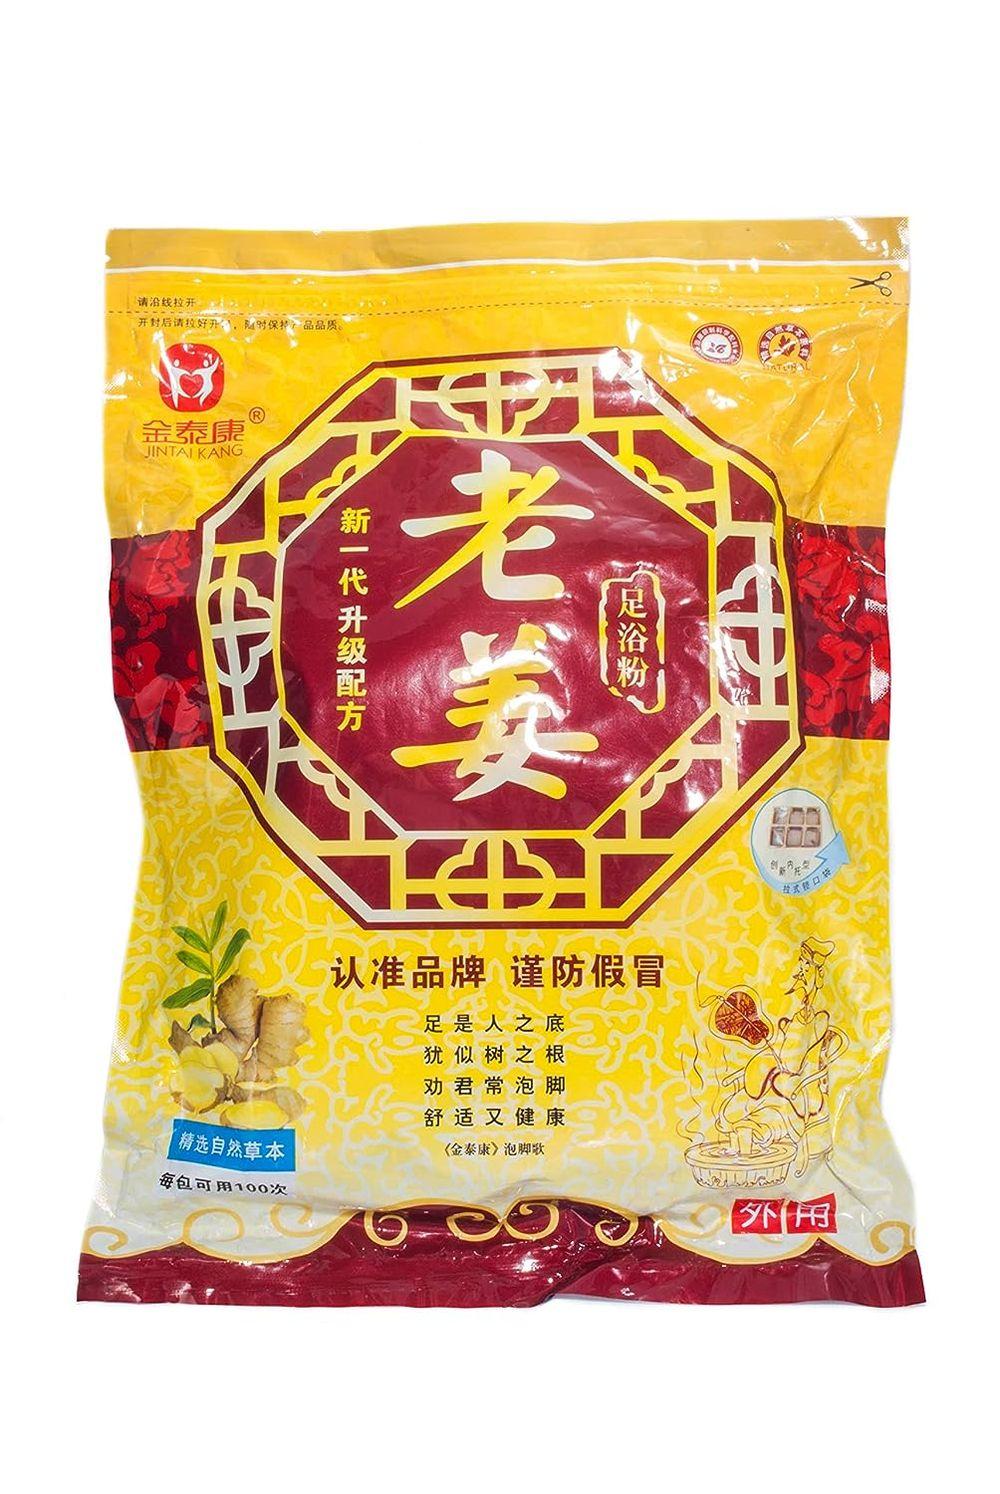 100pcs Foot Reflexology Chinese Medicine Foot Bath Powder Kits Cold Blood (Wormwood)